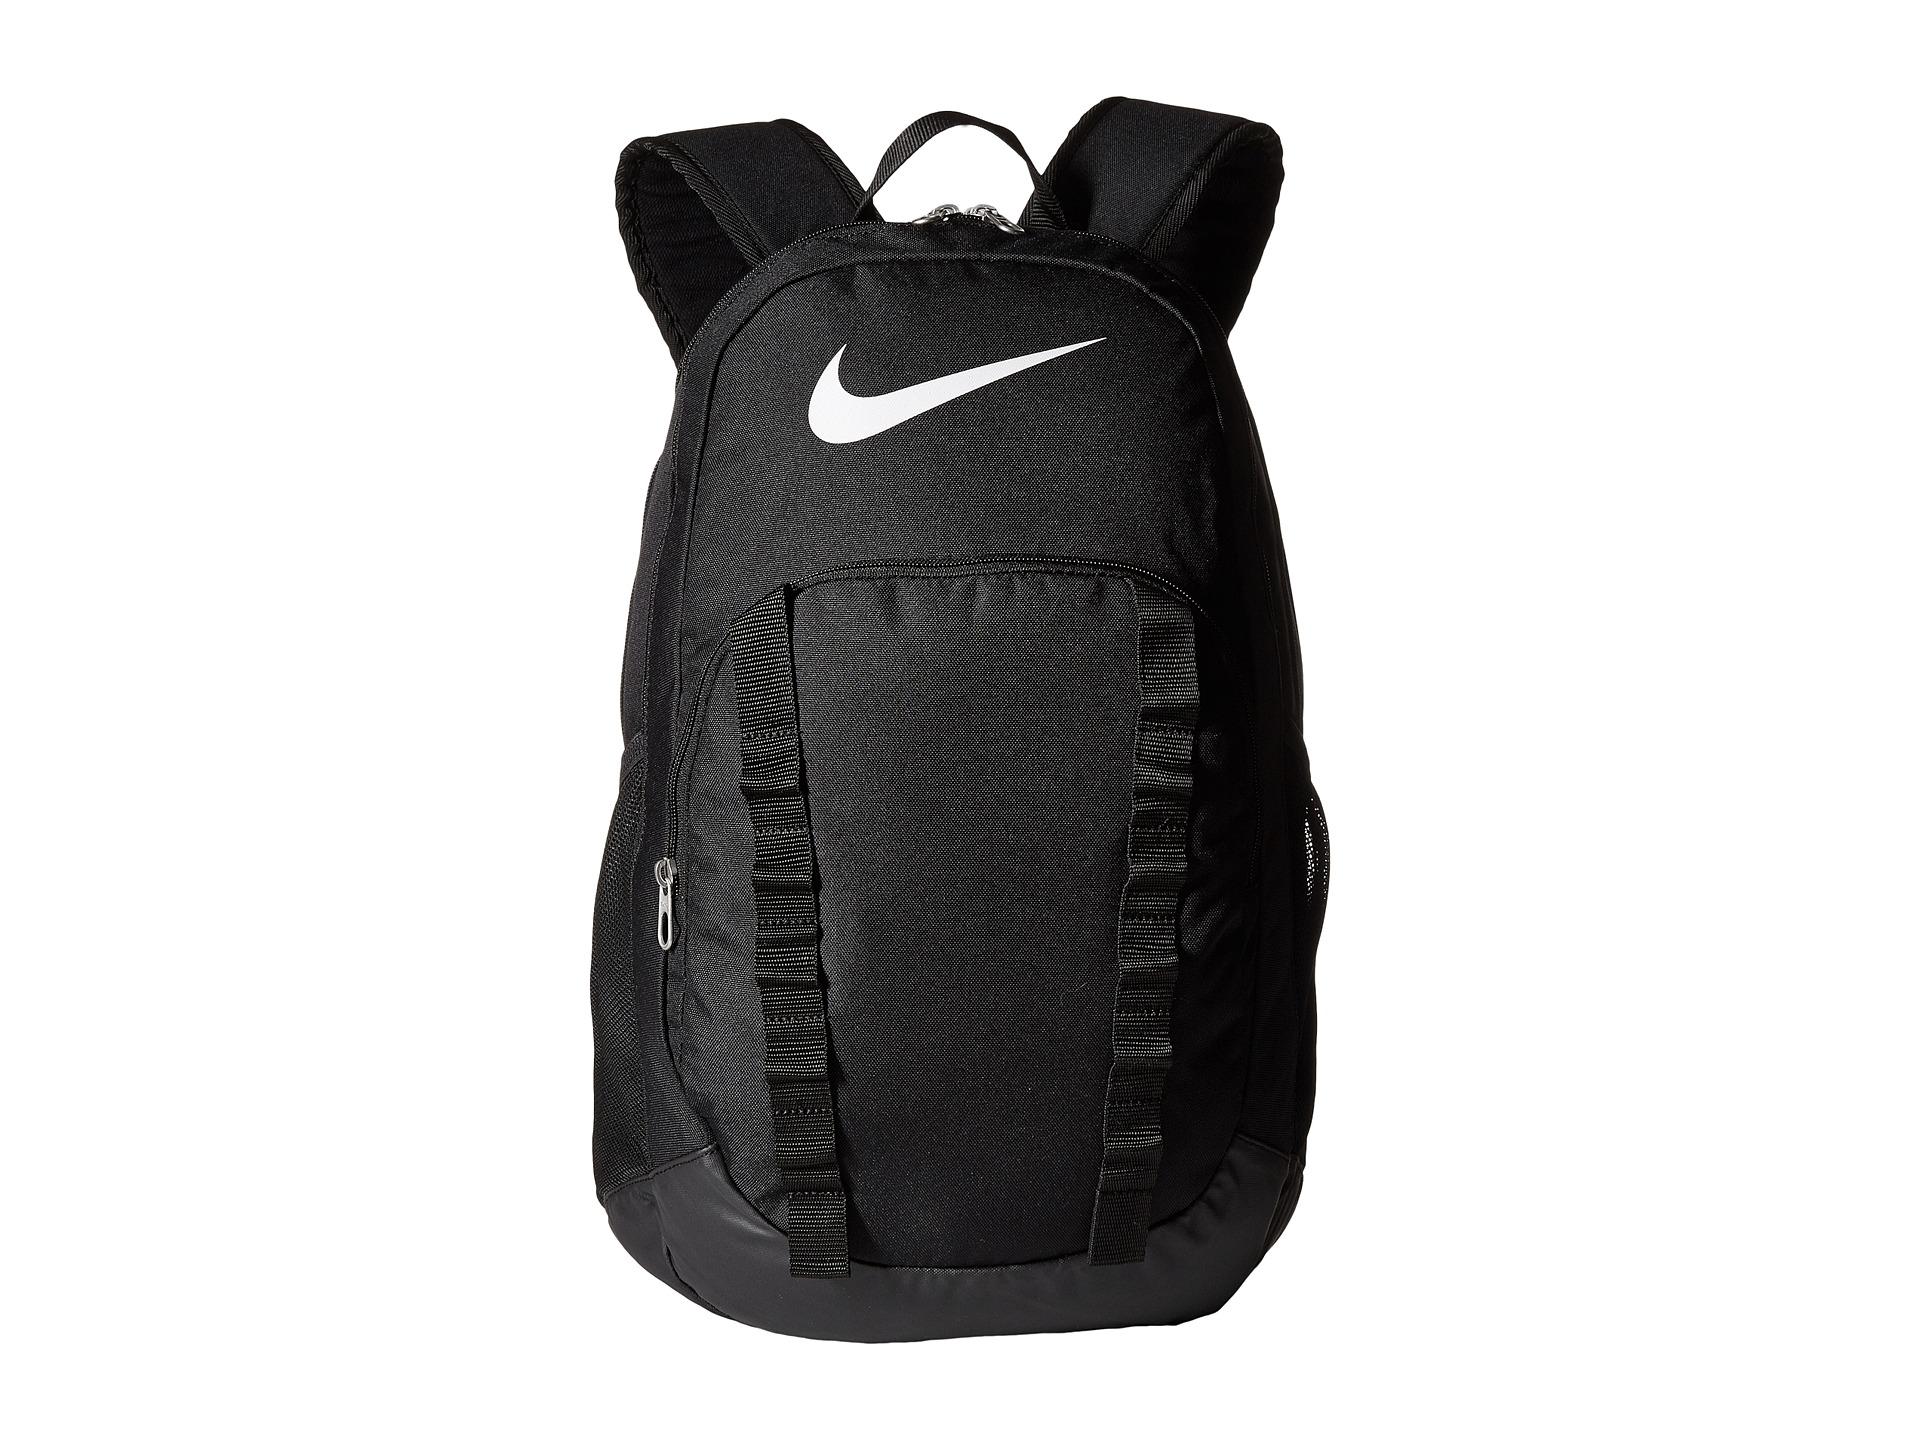 a4562ec83f3a9 Nike Brasilia 7 Backpack Xl in Black - Lyst